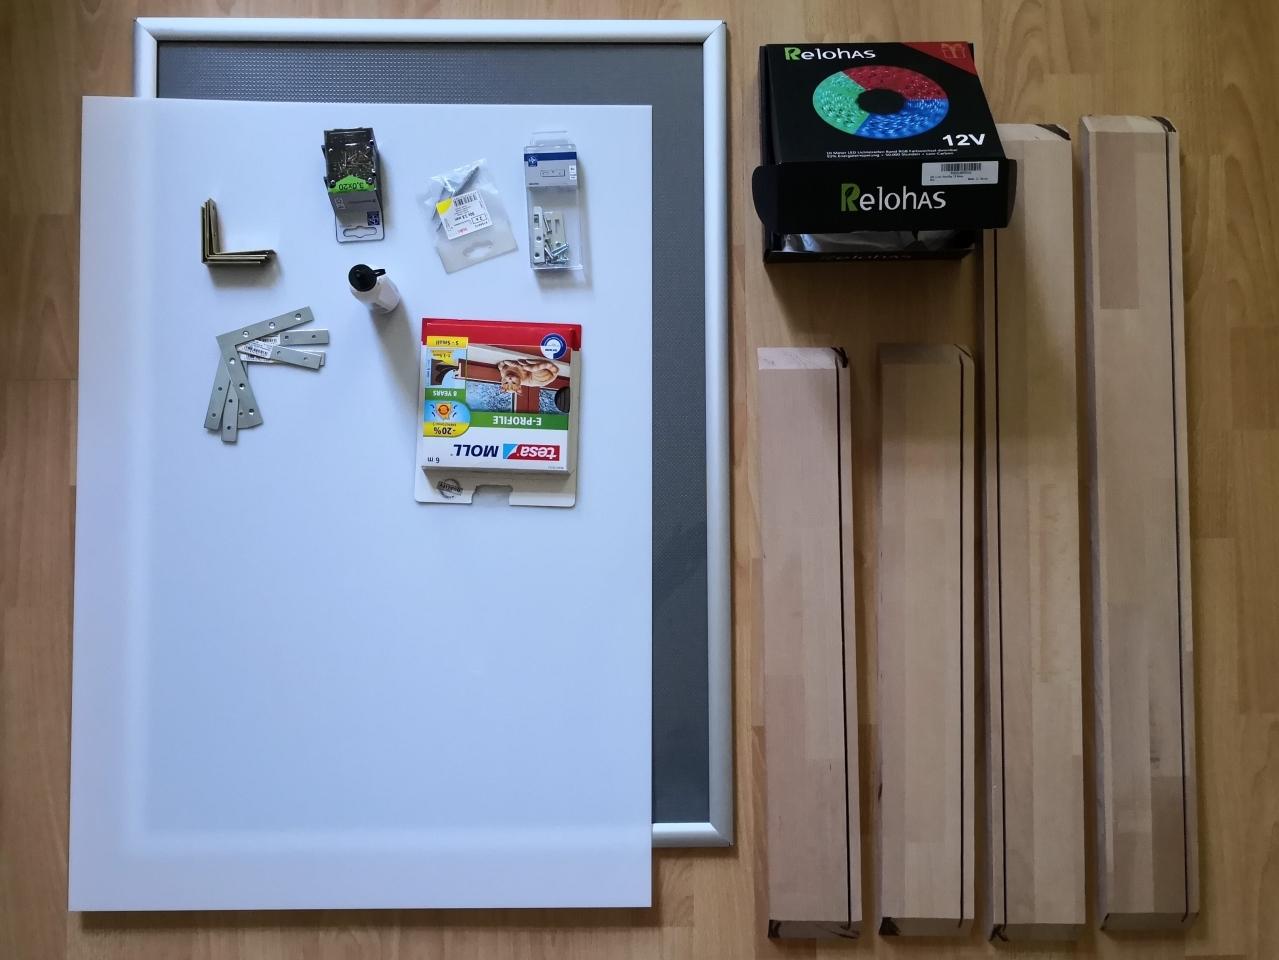 lichtbox selber bauen affordable anleitung letterbox rahmen fr bauen with lichtbox selber bauen. Black Bedroom Furniture Sets. Home Design Ideas